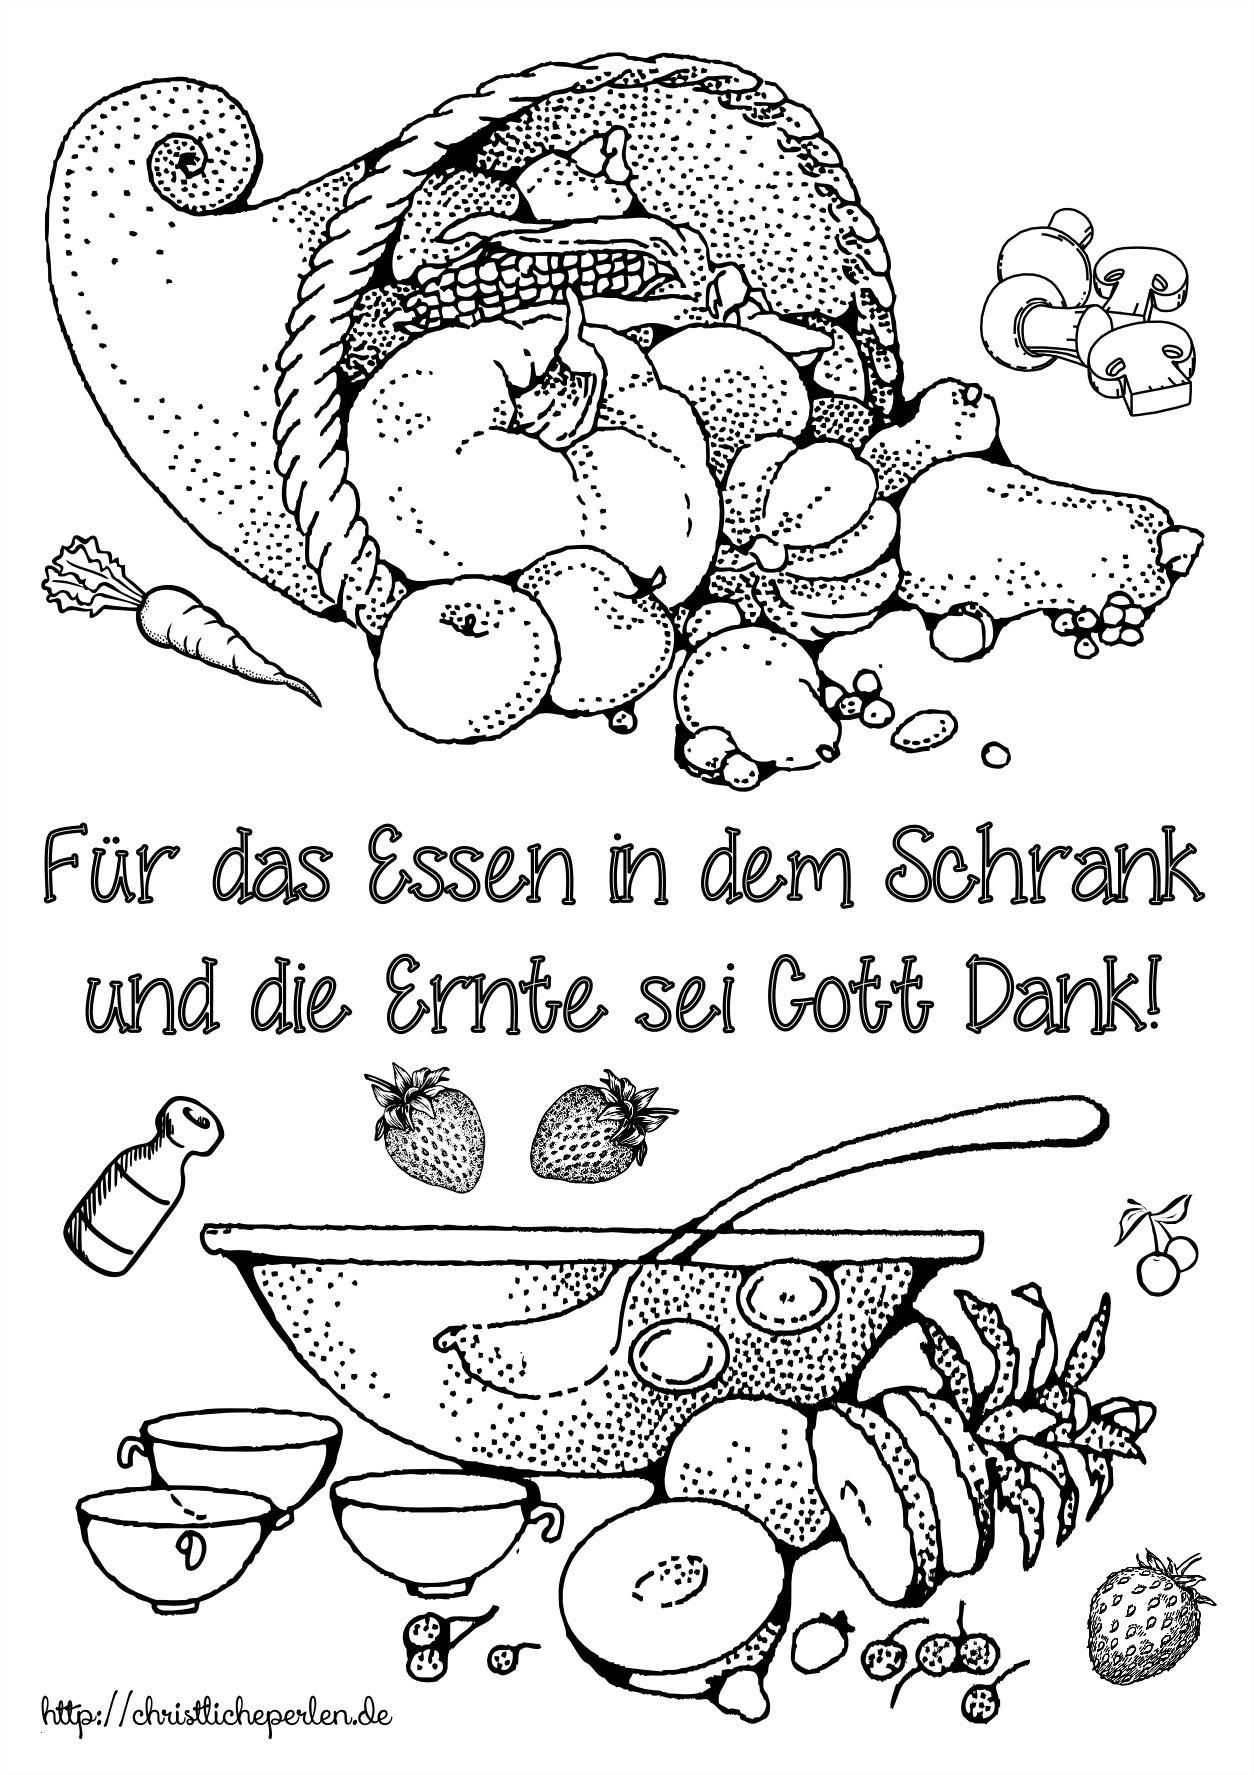 Verkehrserziehung Kindergarten Ausmalbilder Einzigartig Kindergarten Bilder Zum Ausmalen Blendend Malvorlagen Igel Best Igel Stock